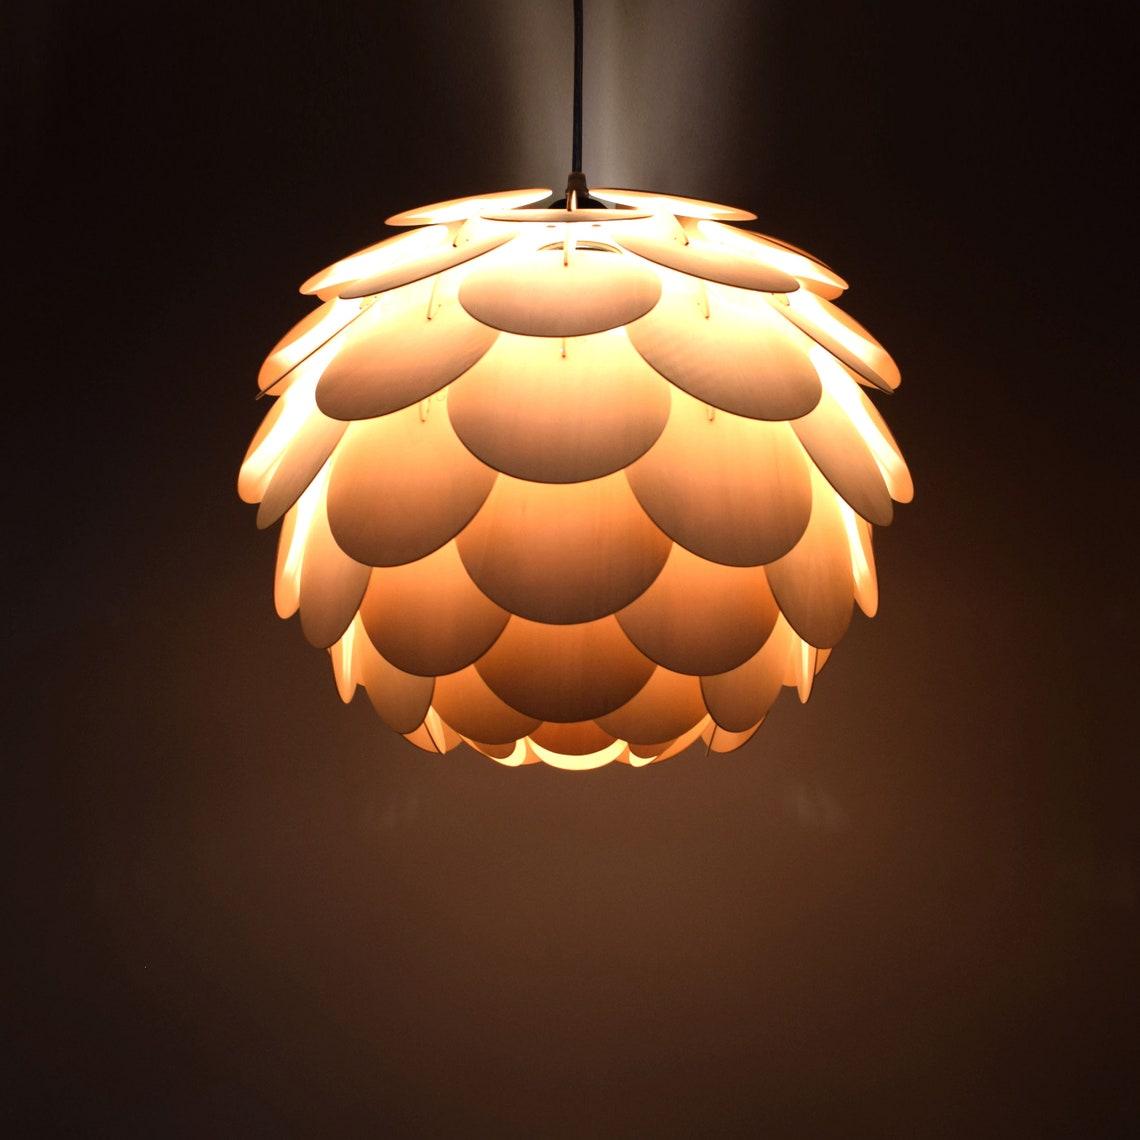 Fast Shipping Pendant Light Ceiling Light Chandelier Lighting Lighting Wood Pendant Light Hanging Lamp Round Pine